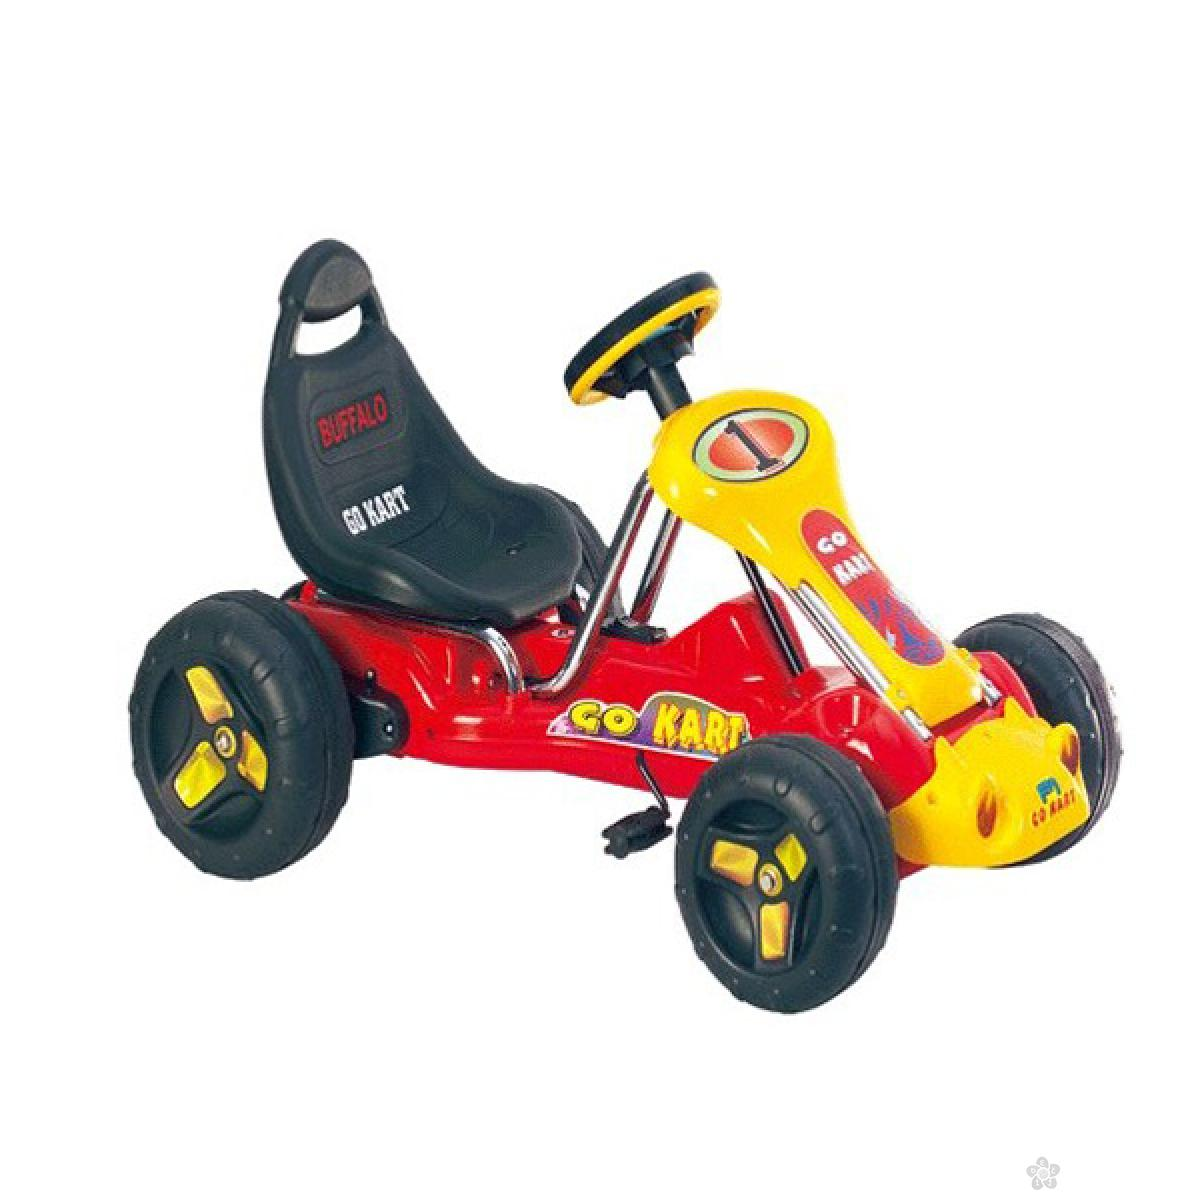 Formula na pedale, model 404 aris